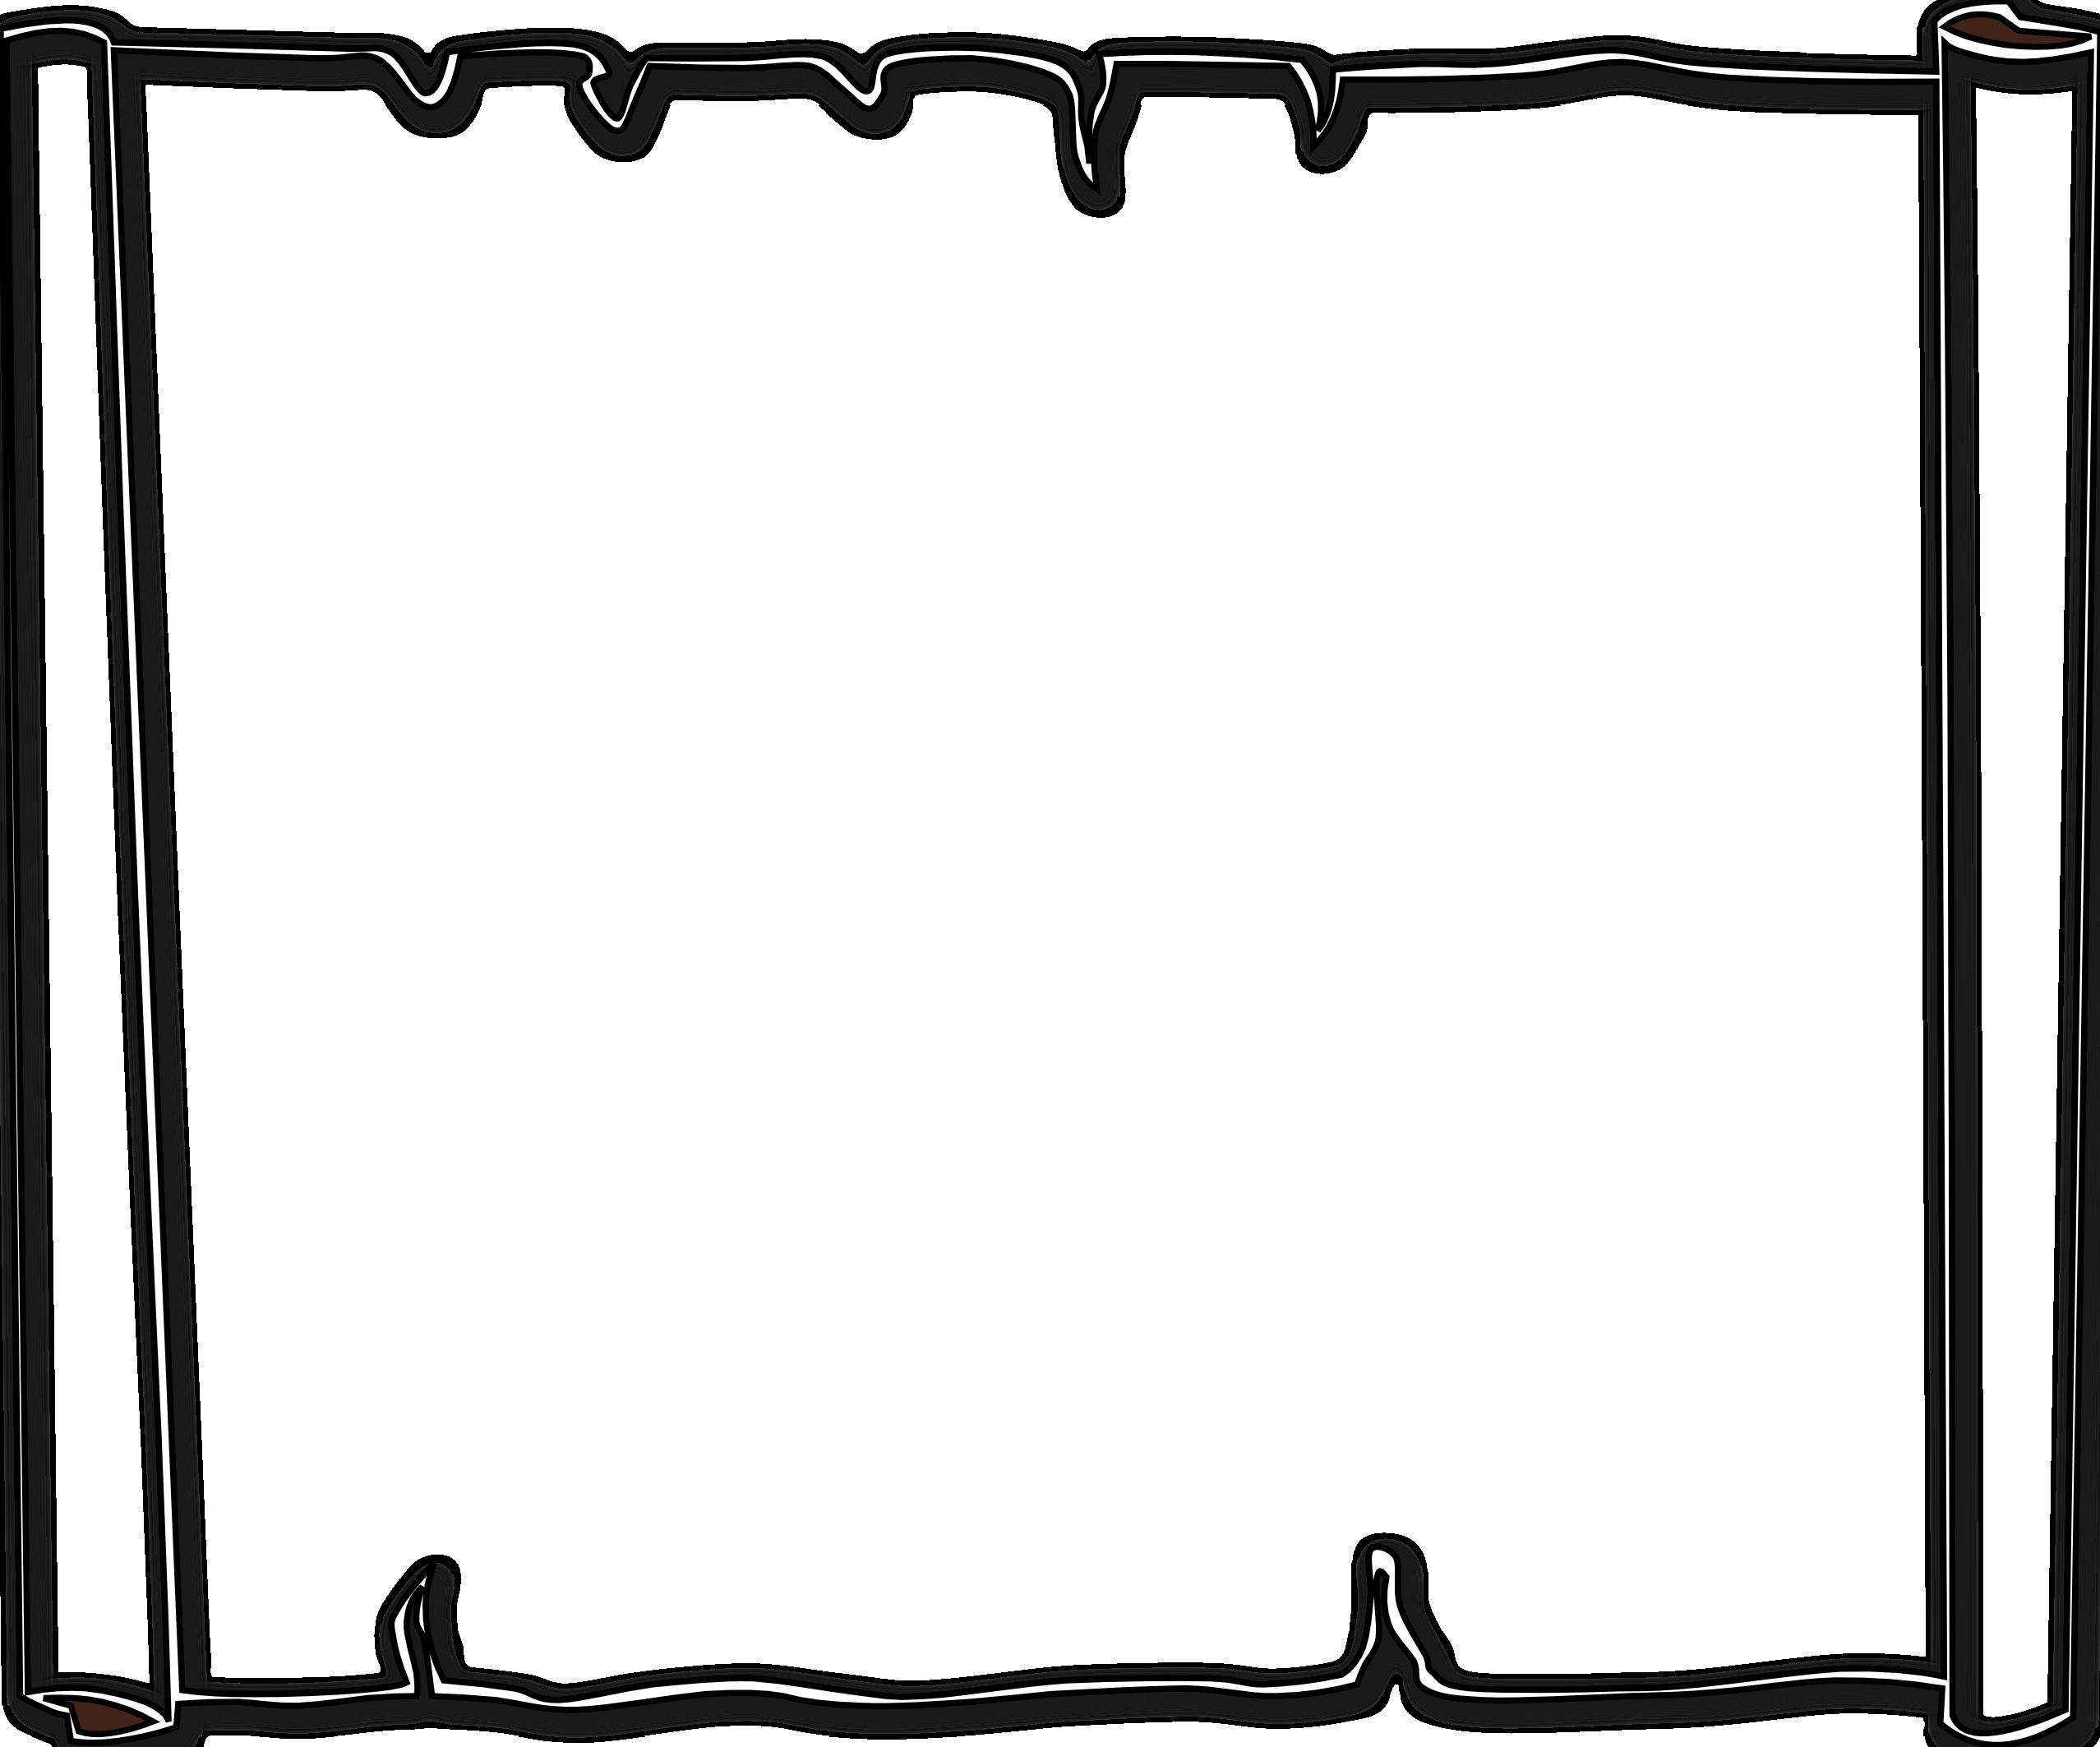 Clipart borders black and white. Simple line border panda